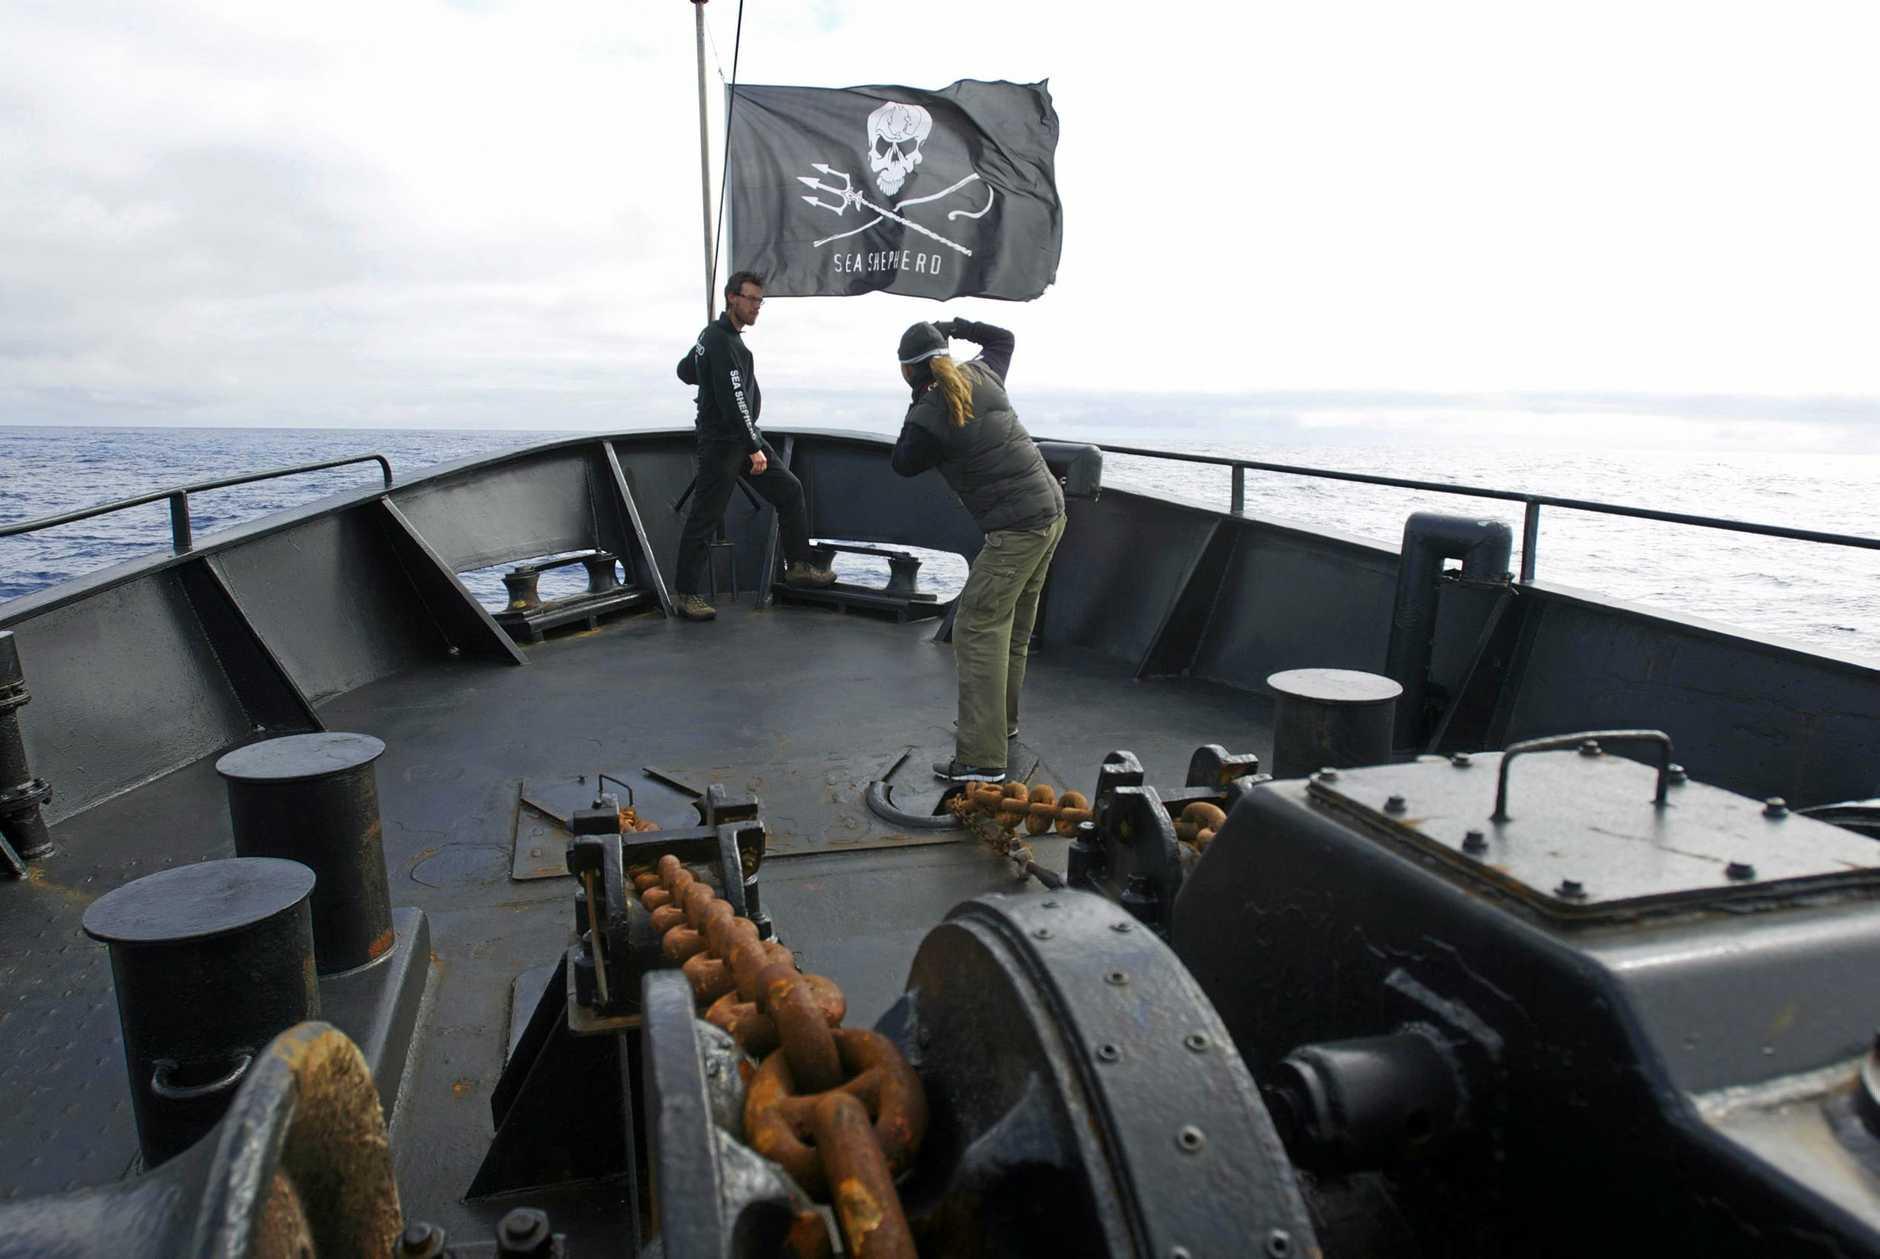 172447Chantal Henderson on the Sea Shepherd